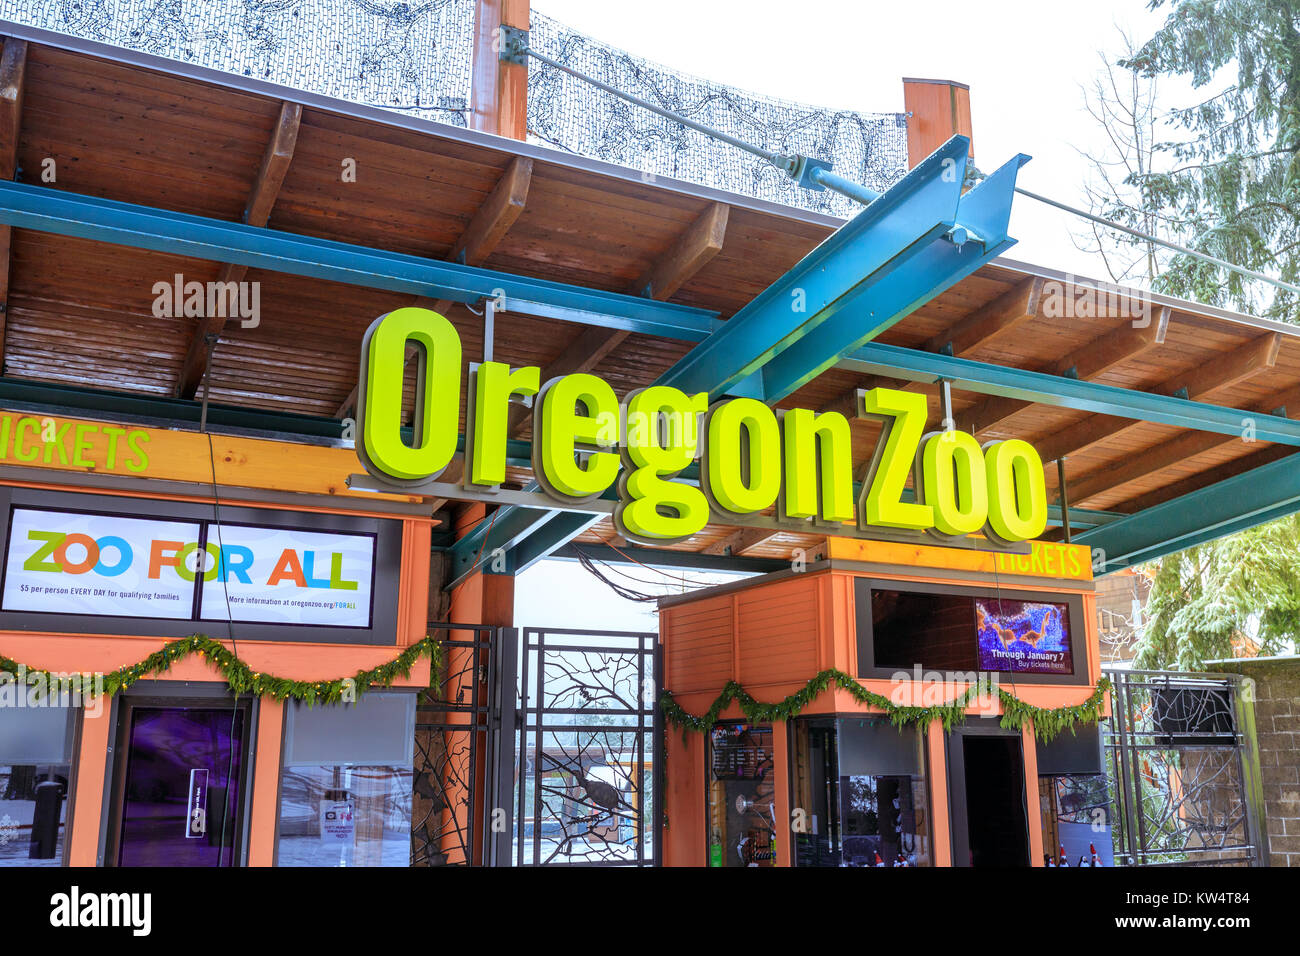 Portland, Oregon, United States - Dec 25, 2017 : The entrance of Oregon Zoo in Washington Park station at winter season Stock Photo